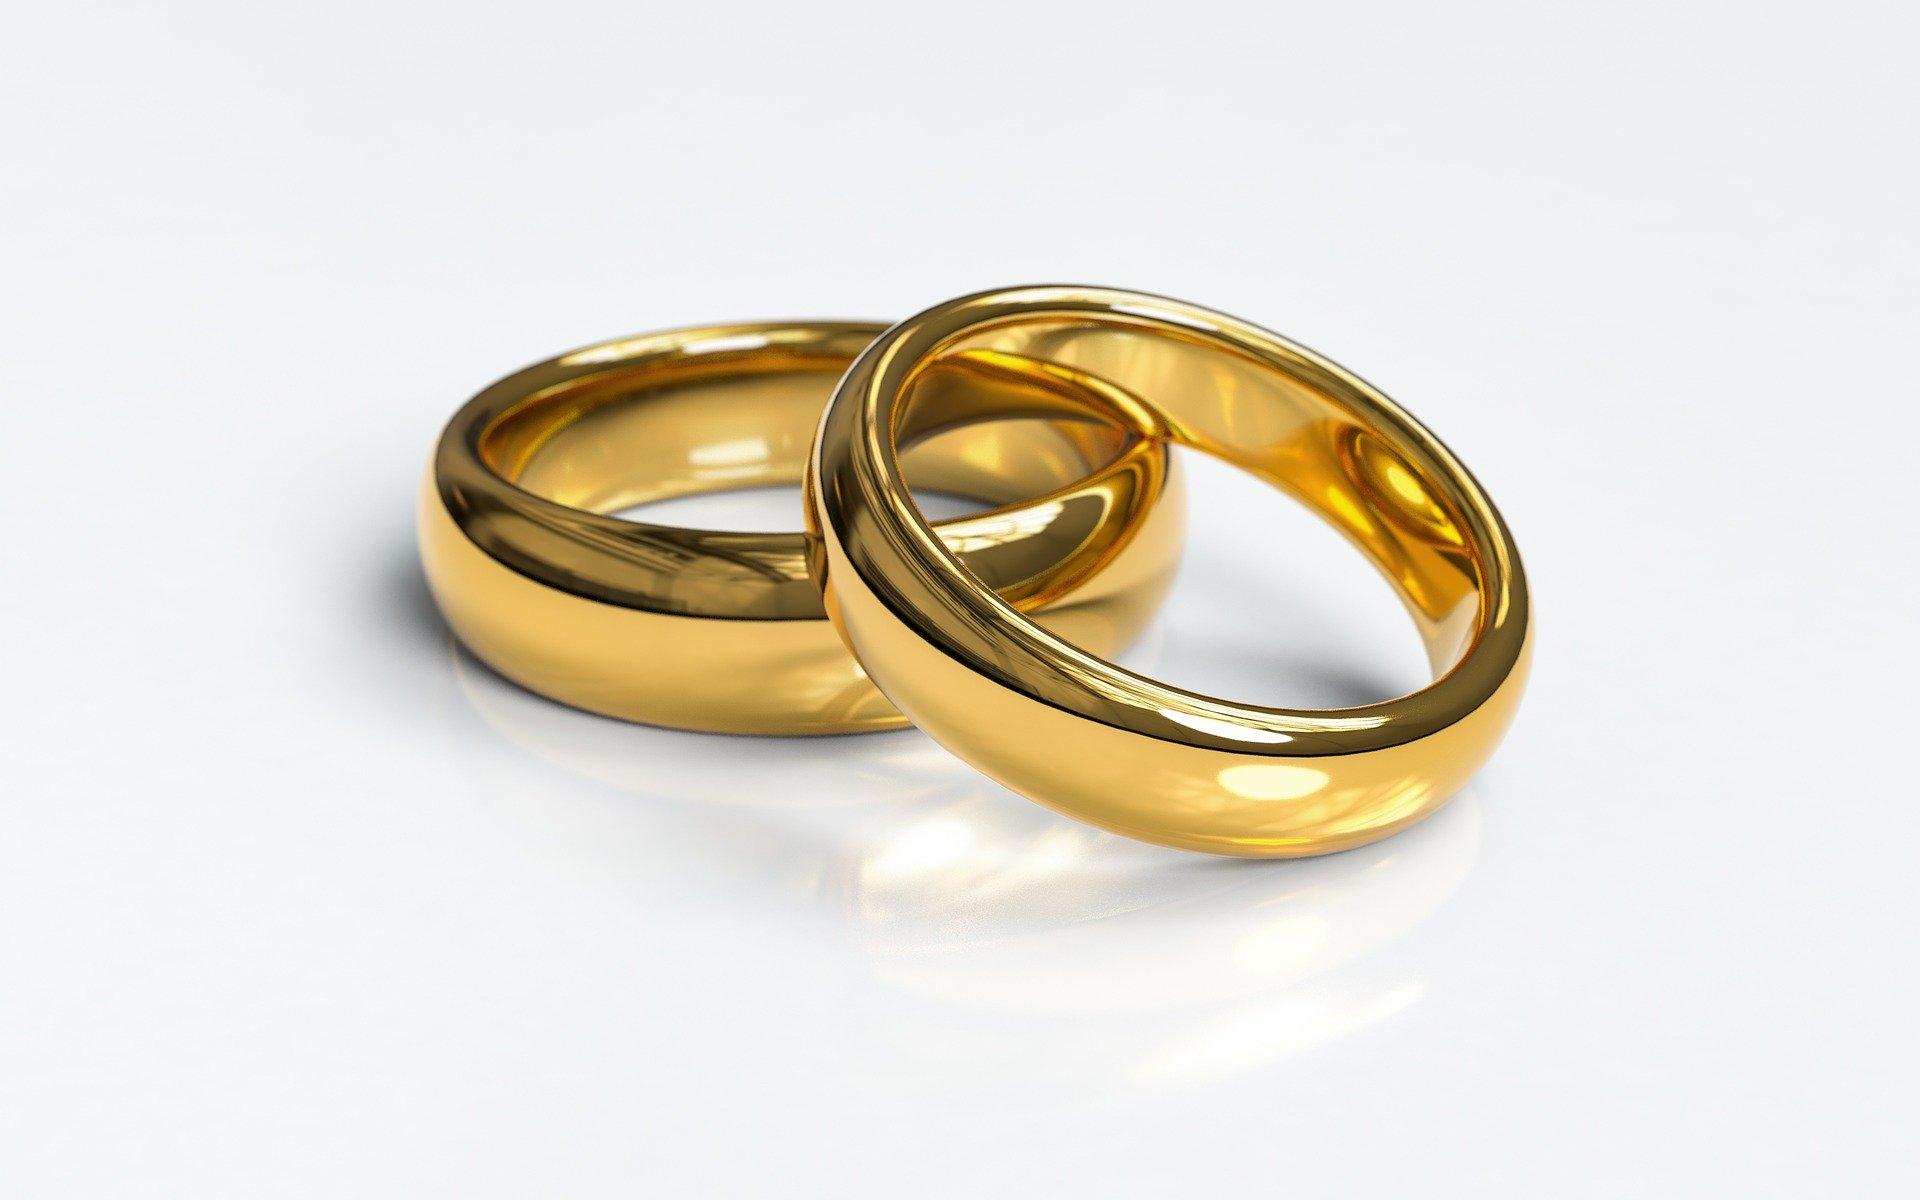 Waarom nog trouwen?